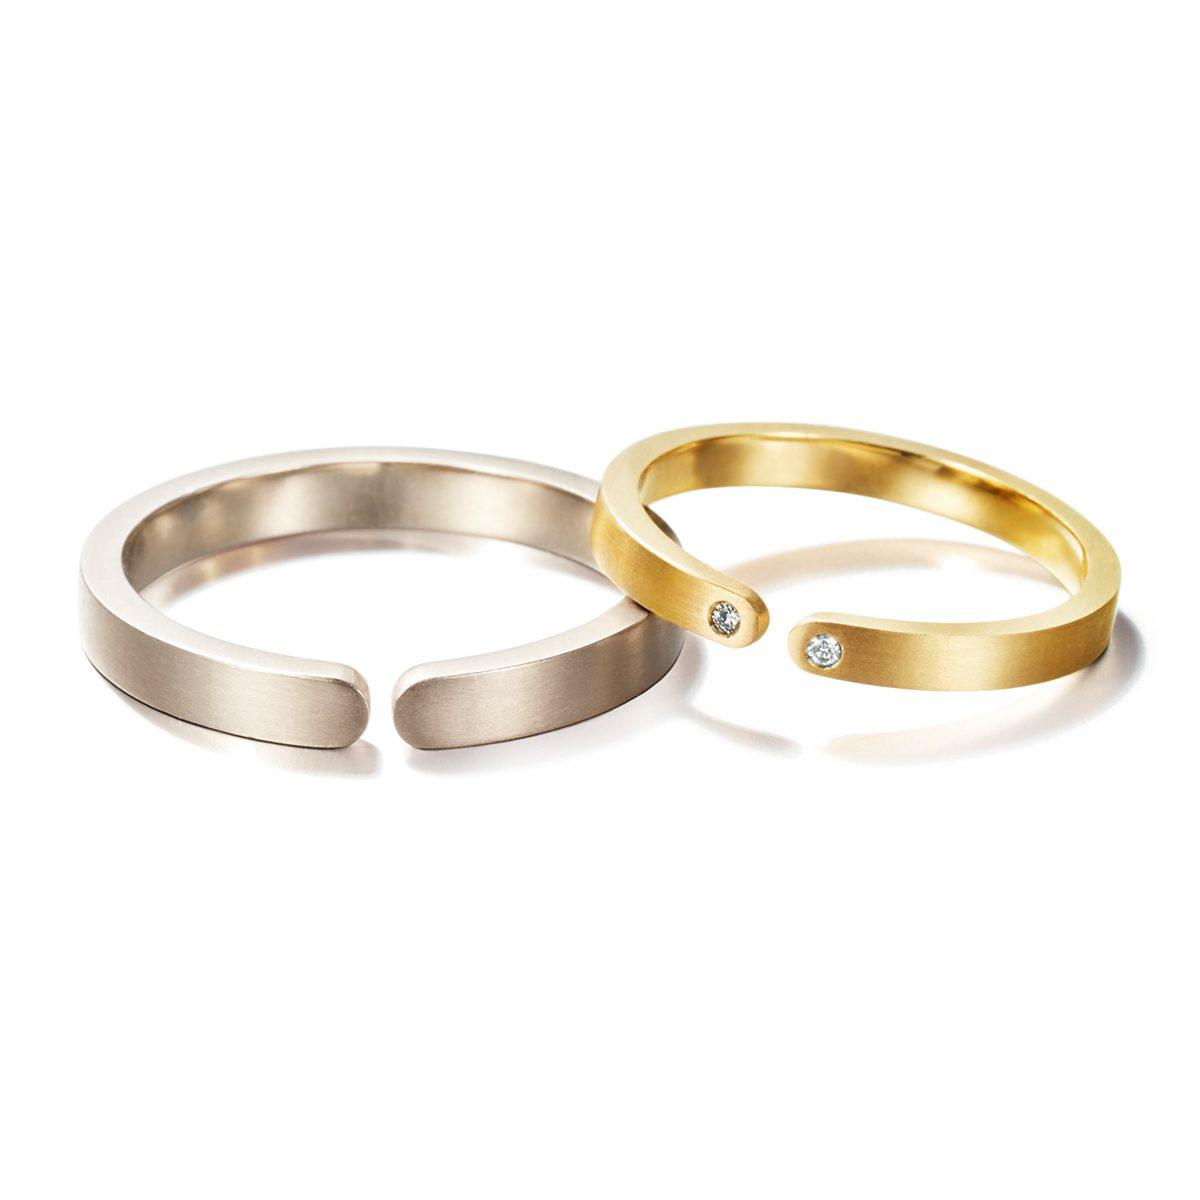 LIA DI GREGORIO - BESIDE Marriage Rings